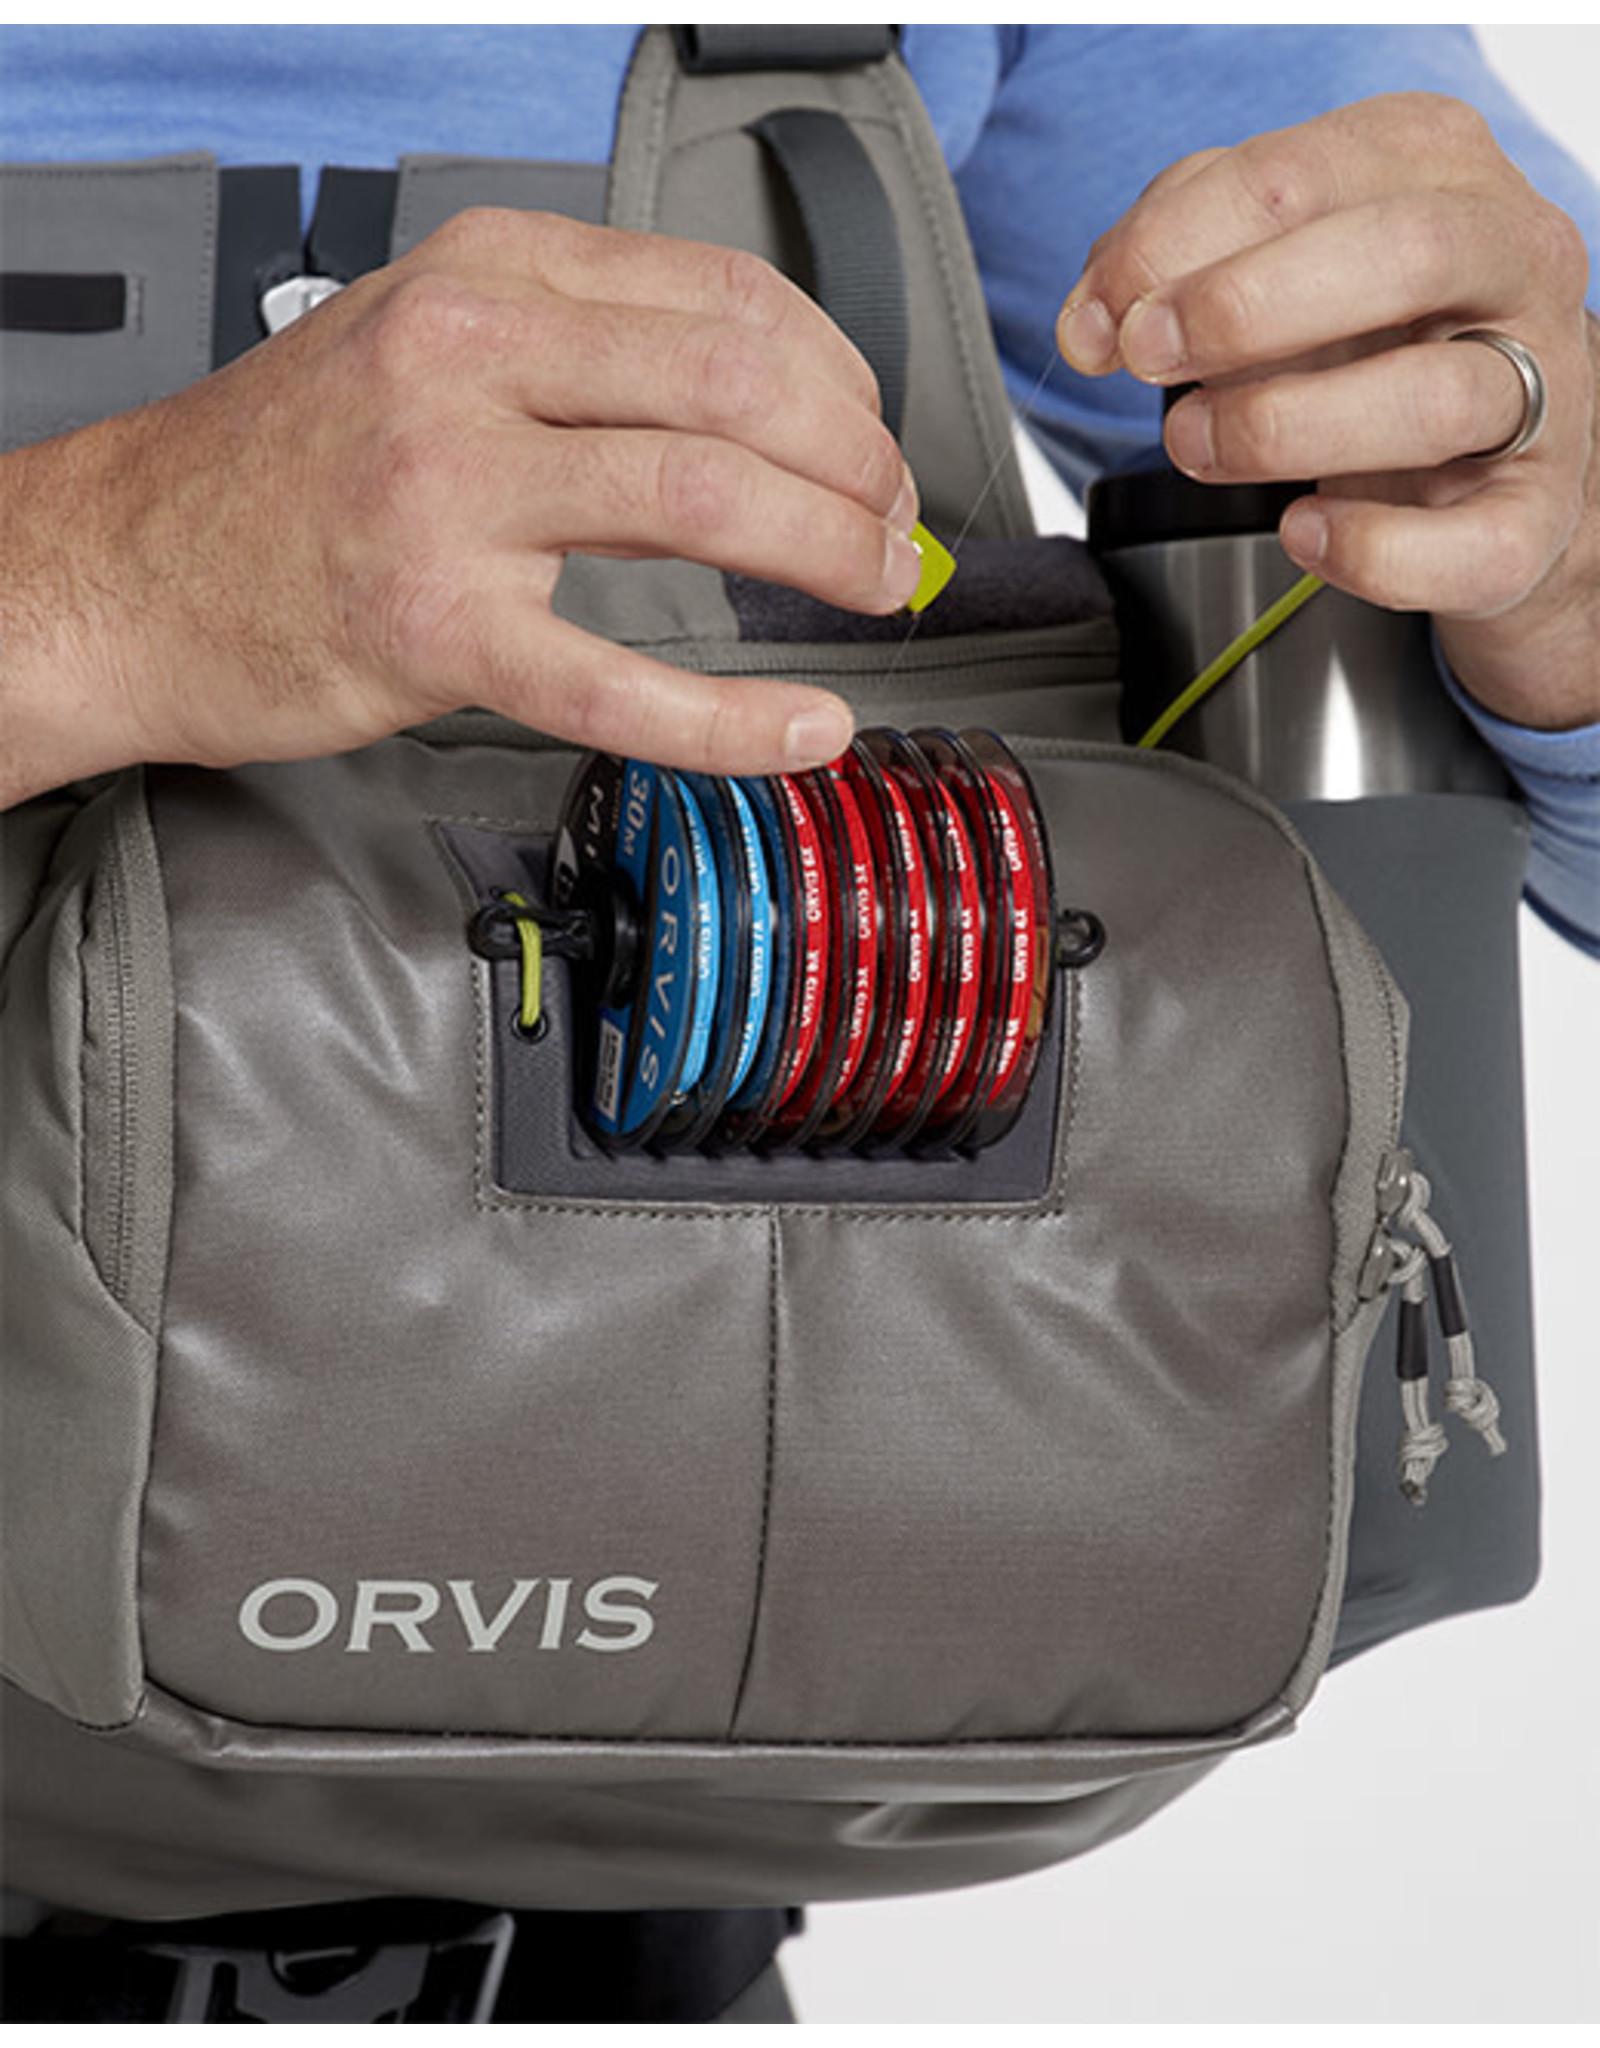 Orvis Guide Sling (Camo)